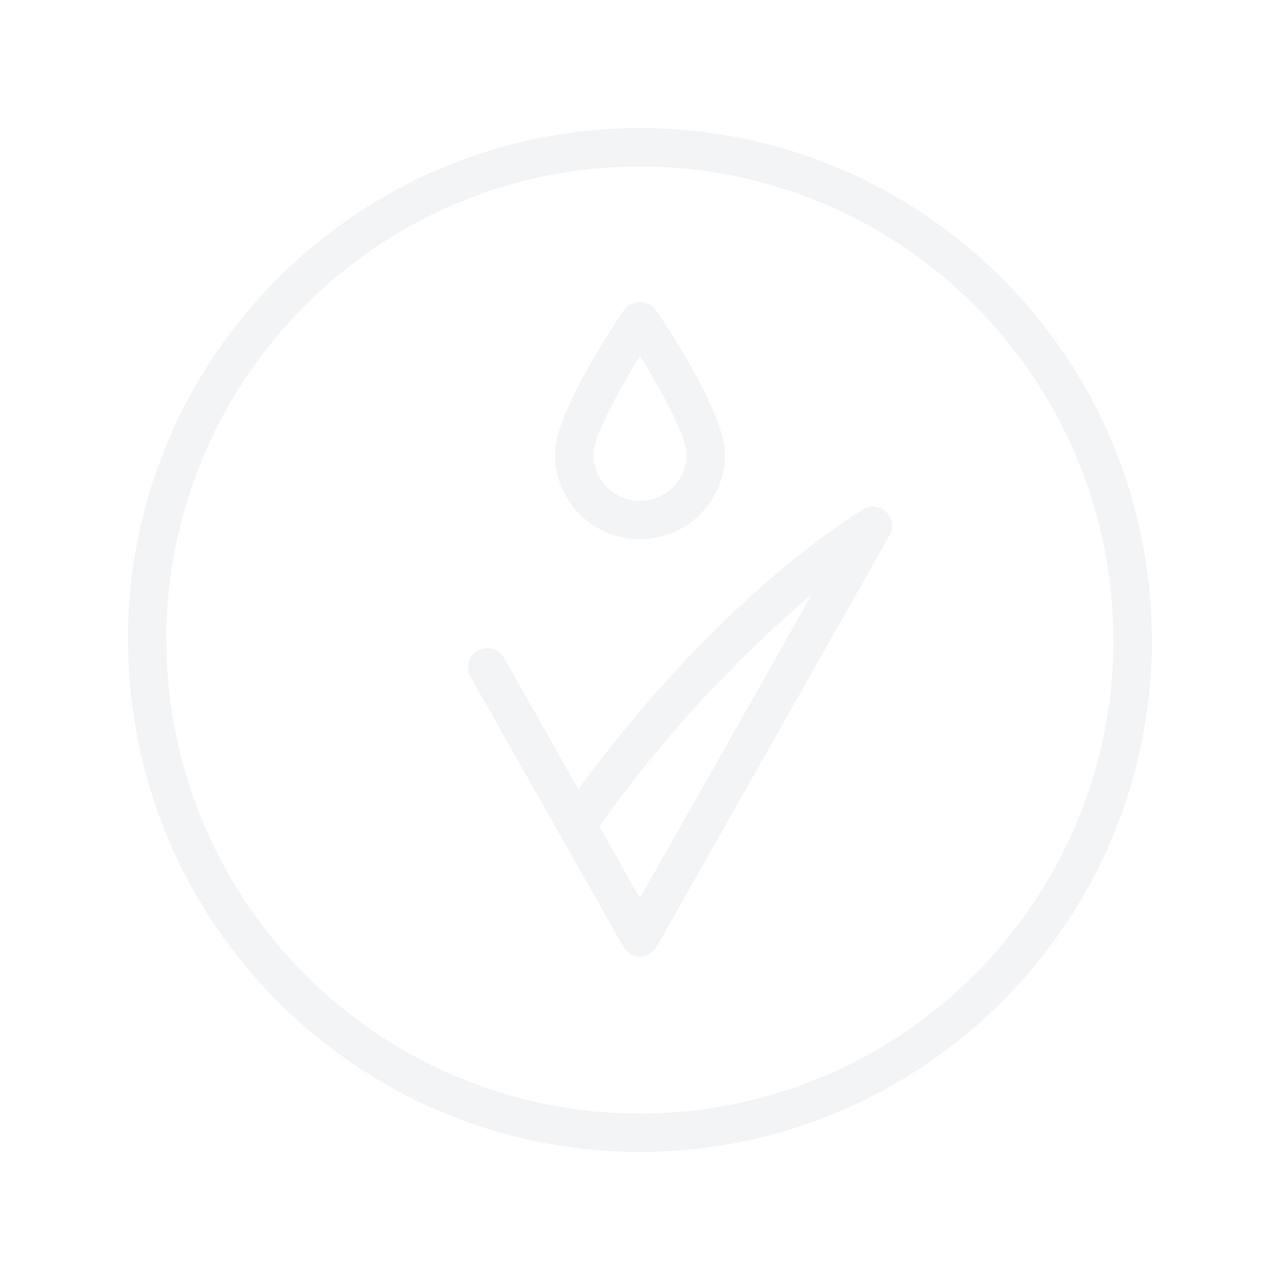 Dr. Hauschka Rose Roll-On Deodorant 50ml